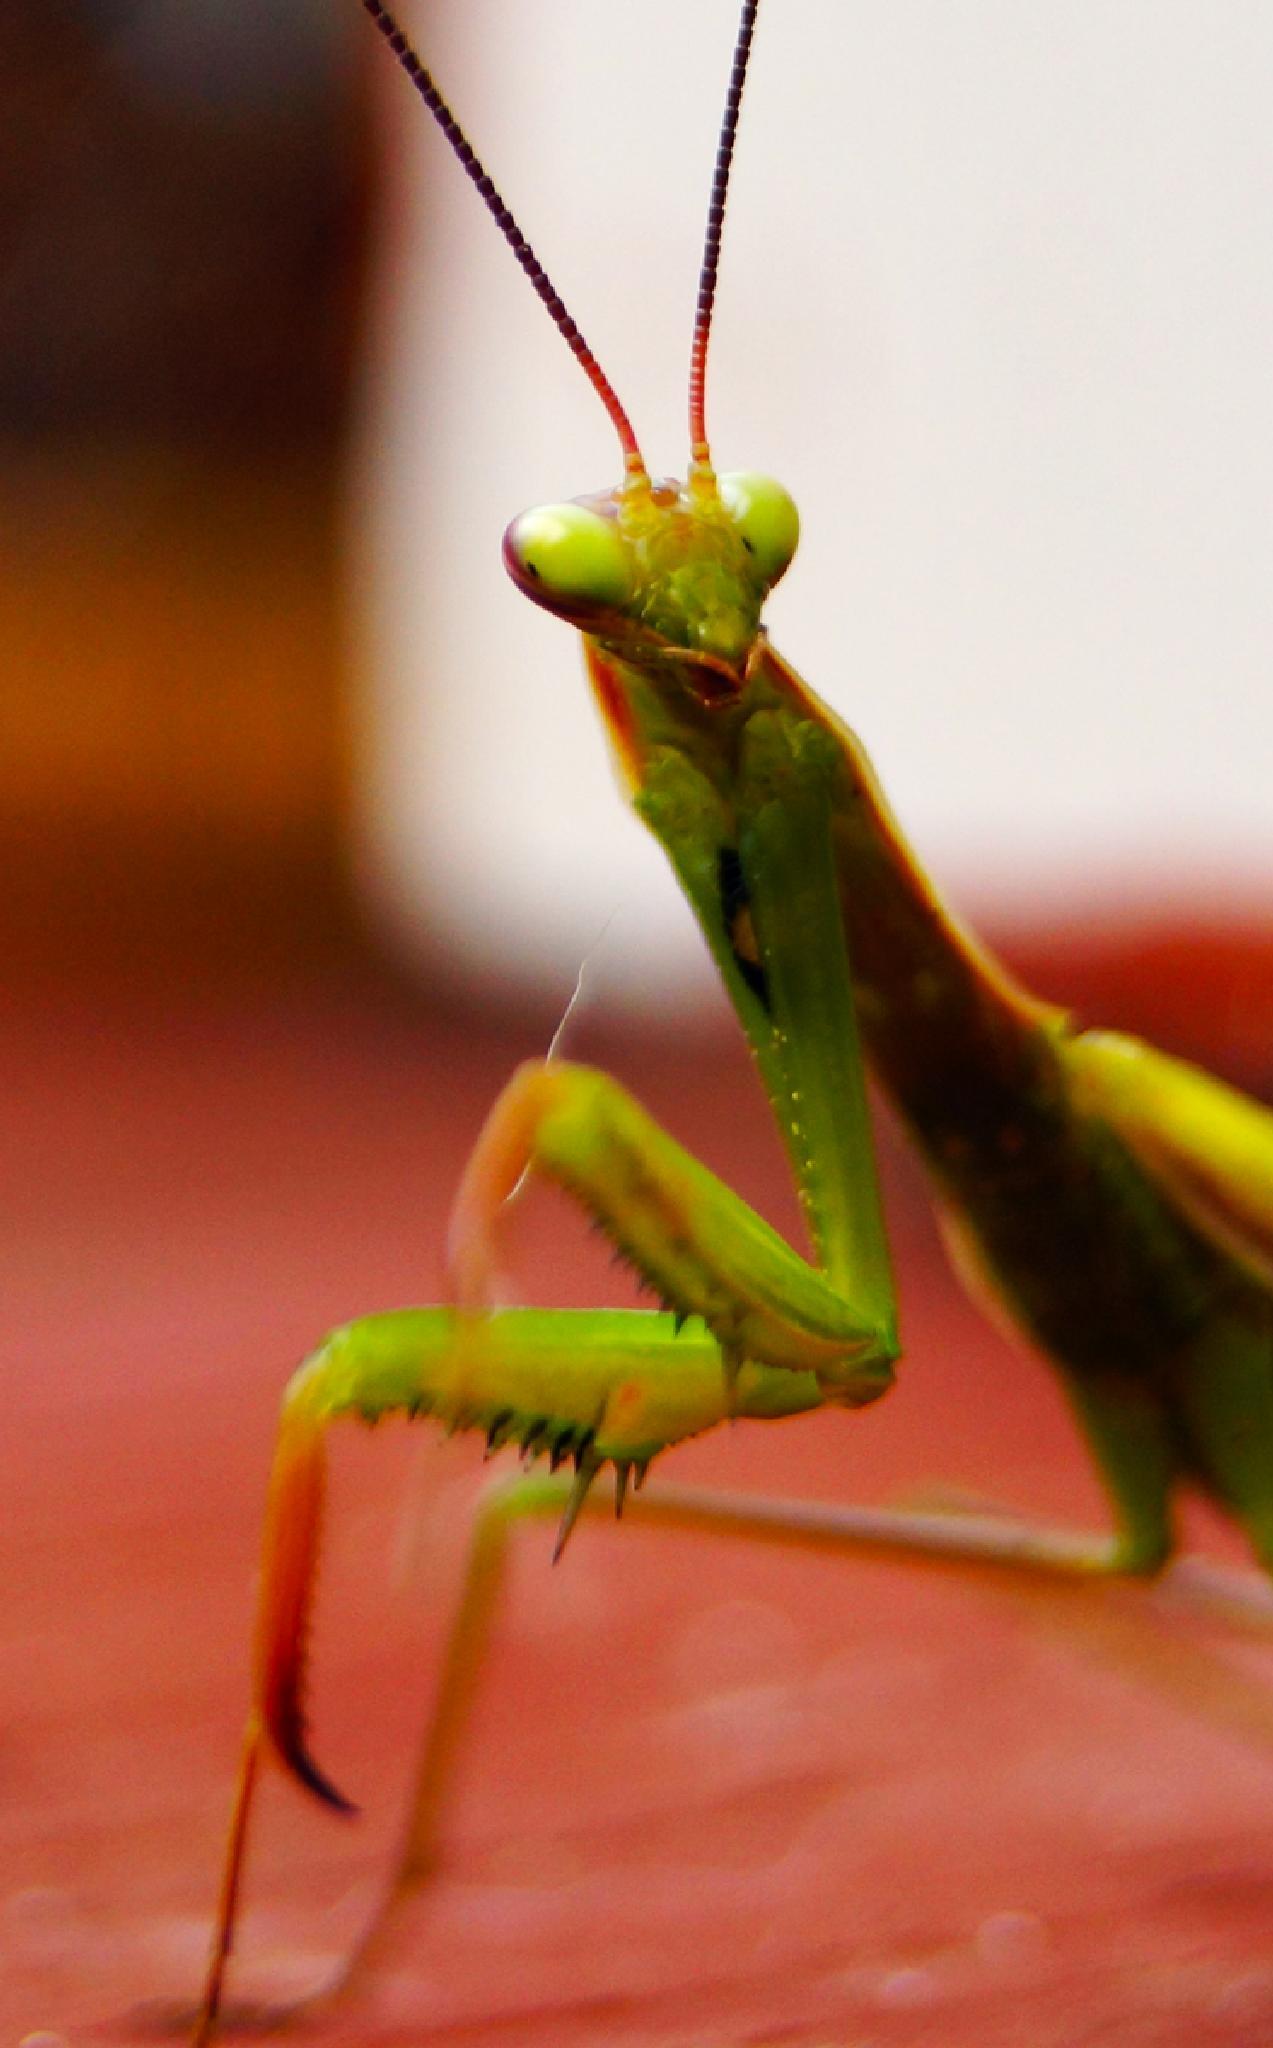 Mantis by douglas.hamilton.984